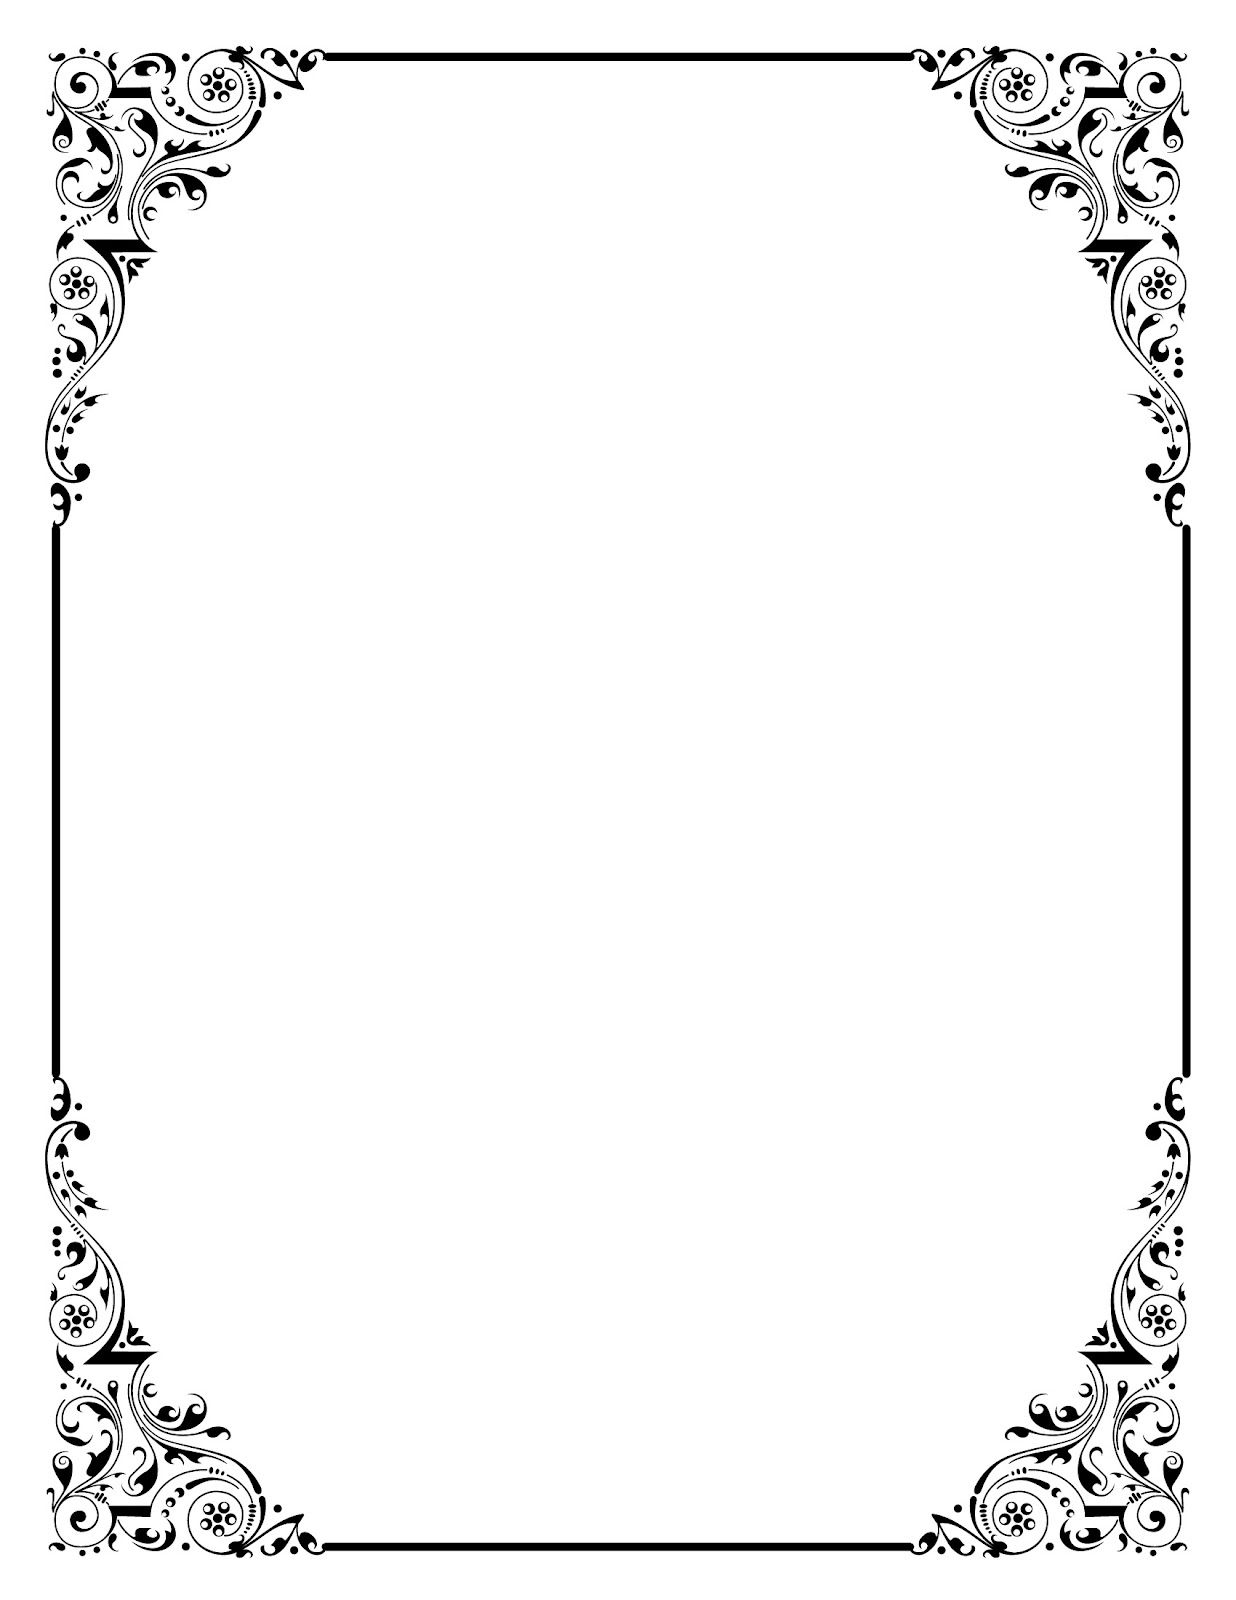 Free Vintage Clip Art Images Free Antique Clip Art Frames Wedding Borders Wedding Invitations Borders Page Borders Design